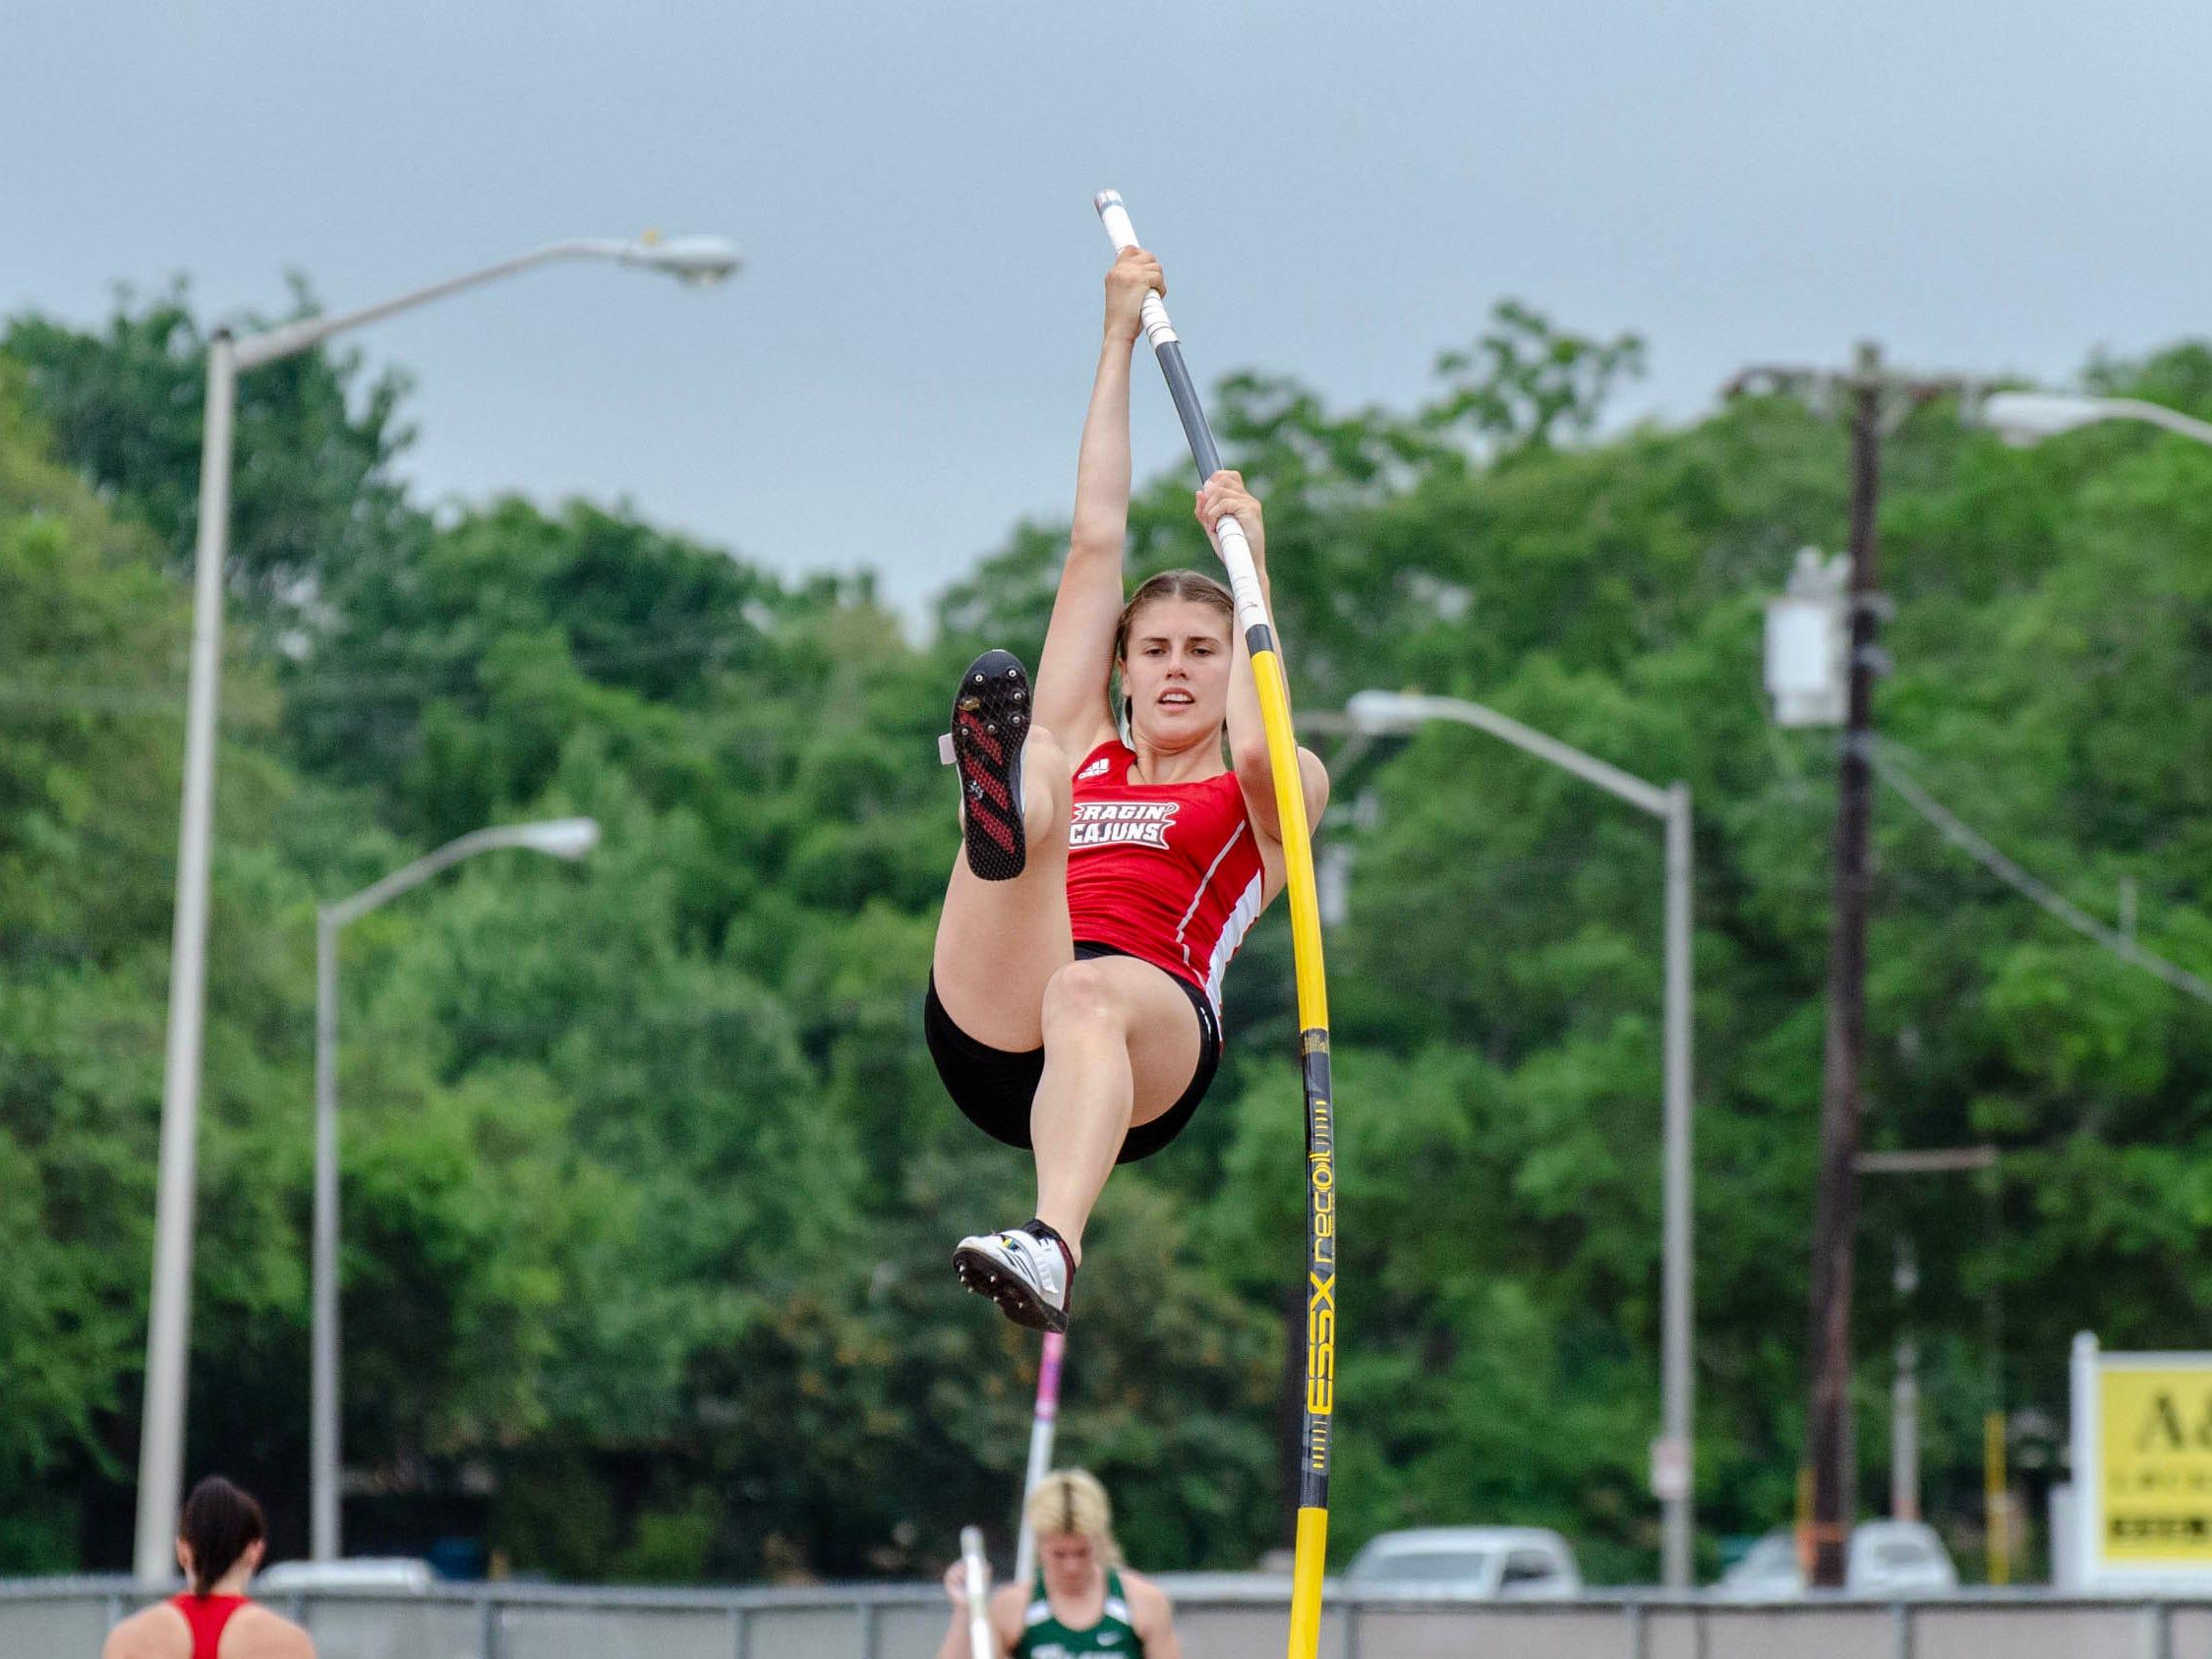 Alexa Johnson competing in pole vault. University of Louisiana at Lafayette host 2019 Cole-Lancon Conference Showdown.